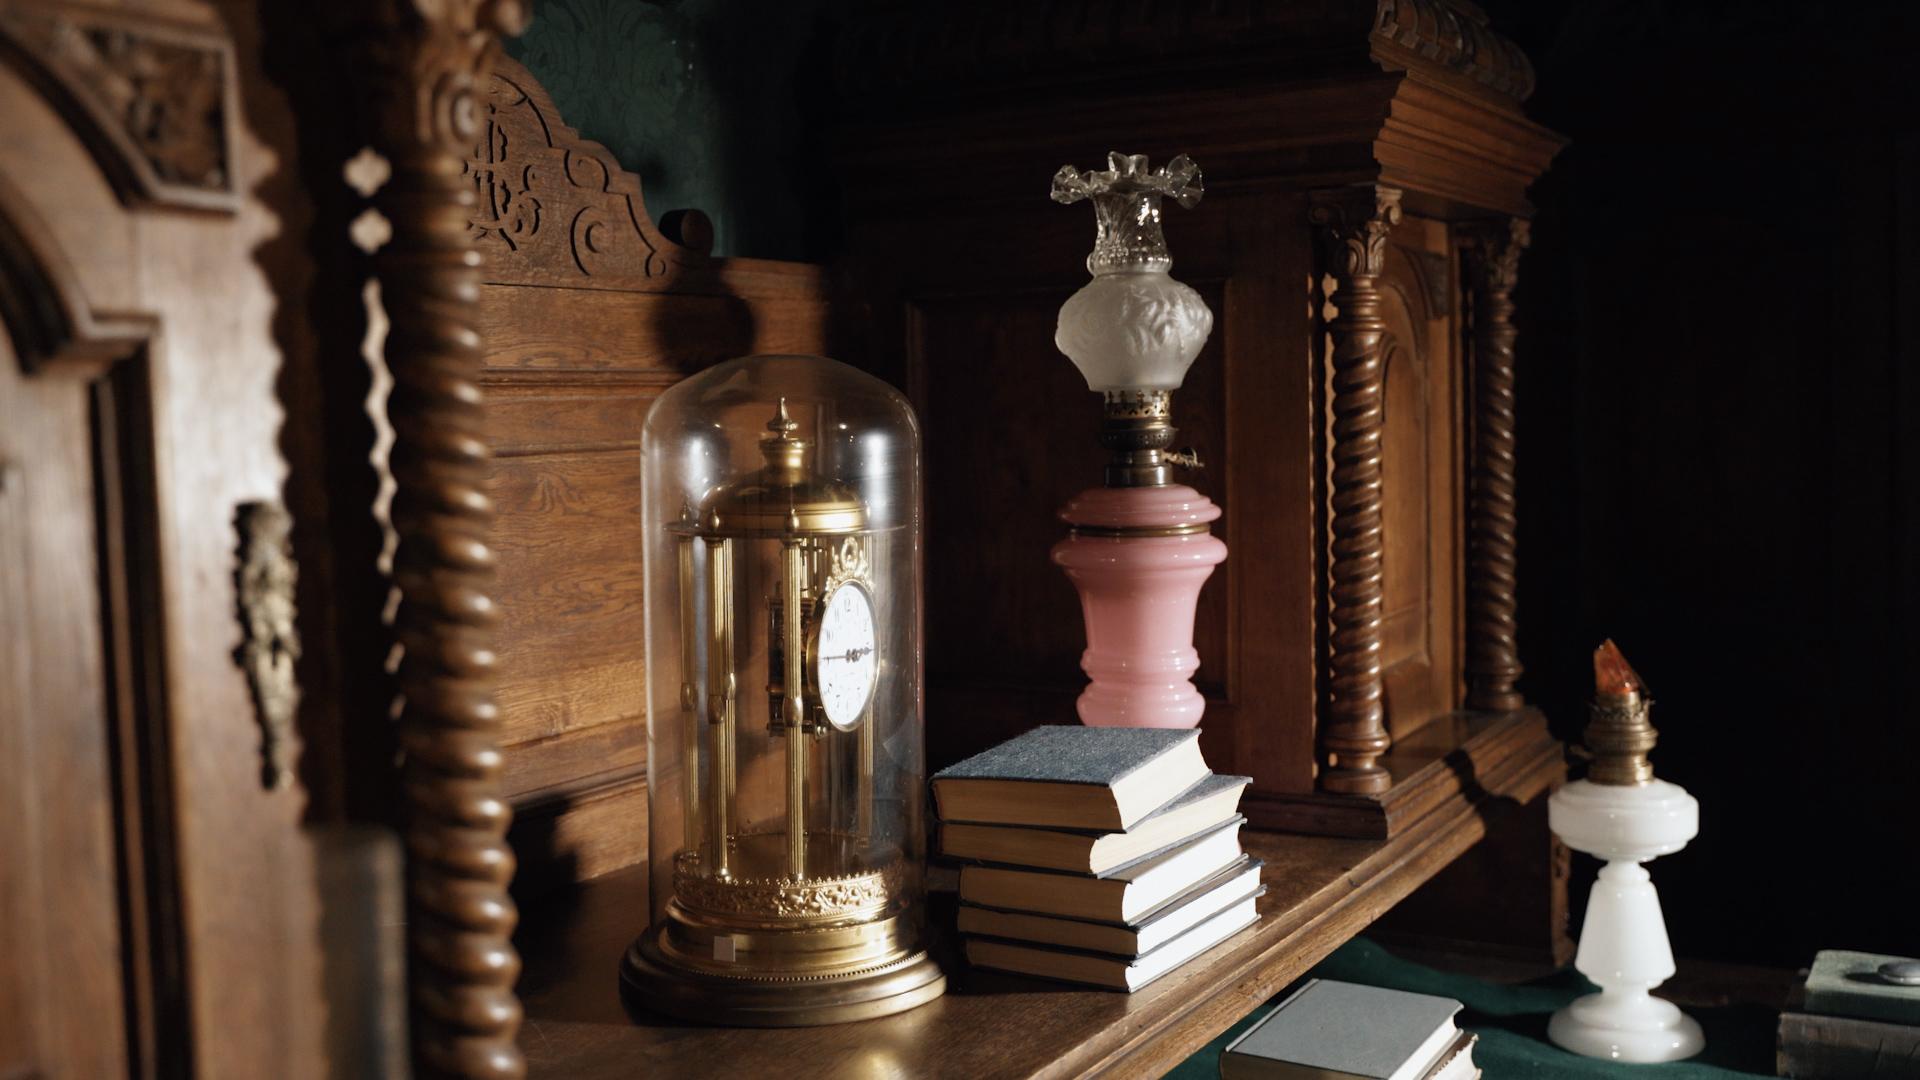 Seni baldai ir senos knygos.